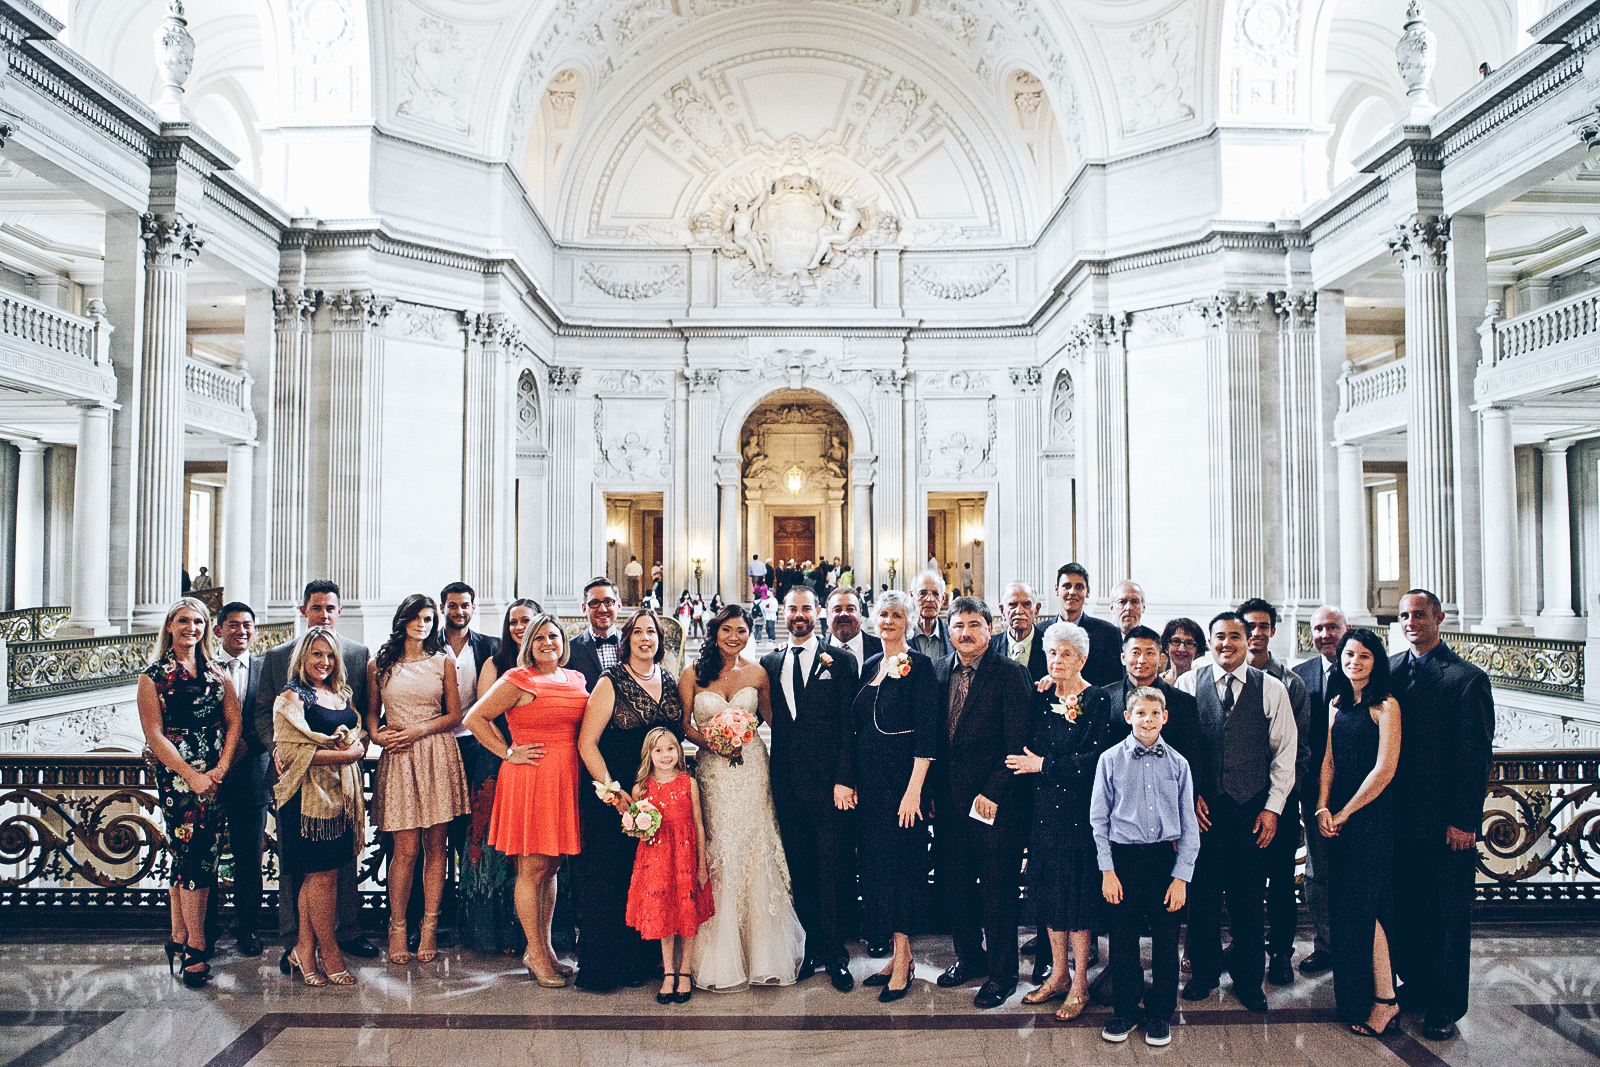 San_francisco_city_hall_wedding_photography_meegan_travis_ebony_siovhan_bokeh_photography_29.jpg